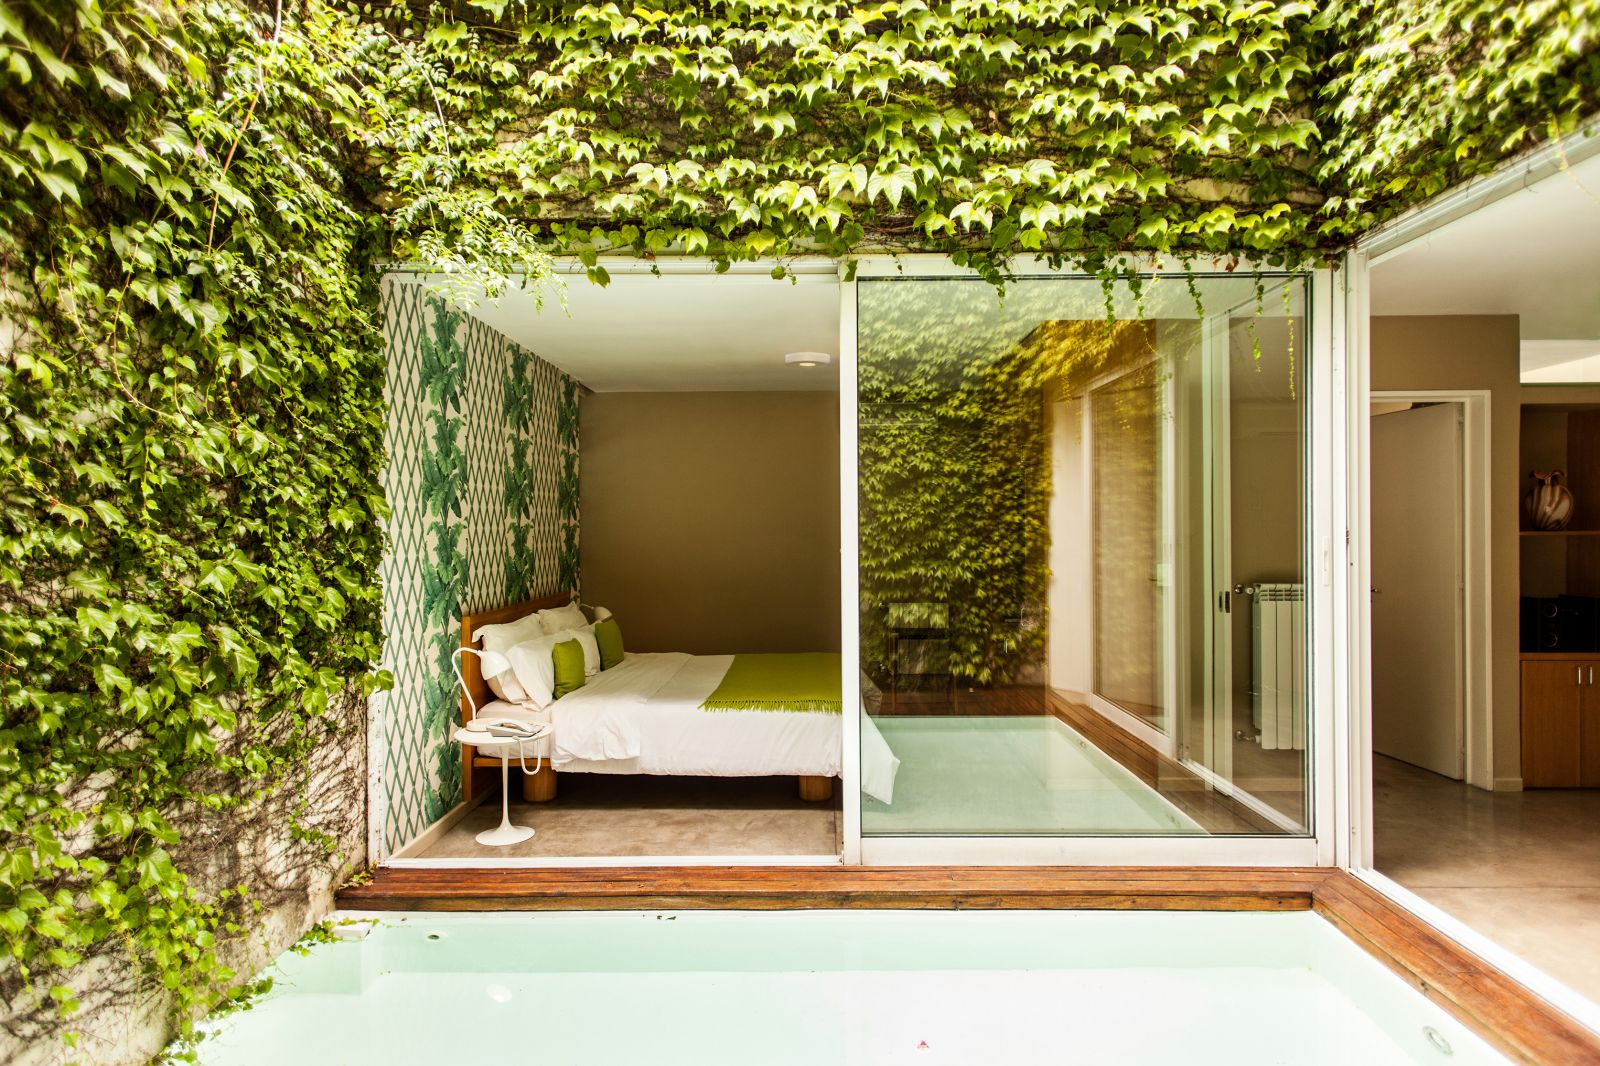 Home_Hotel_BuenosAires-12.jpg